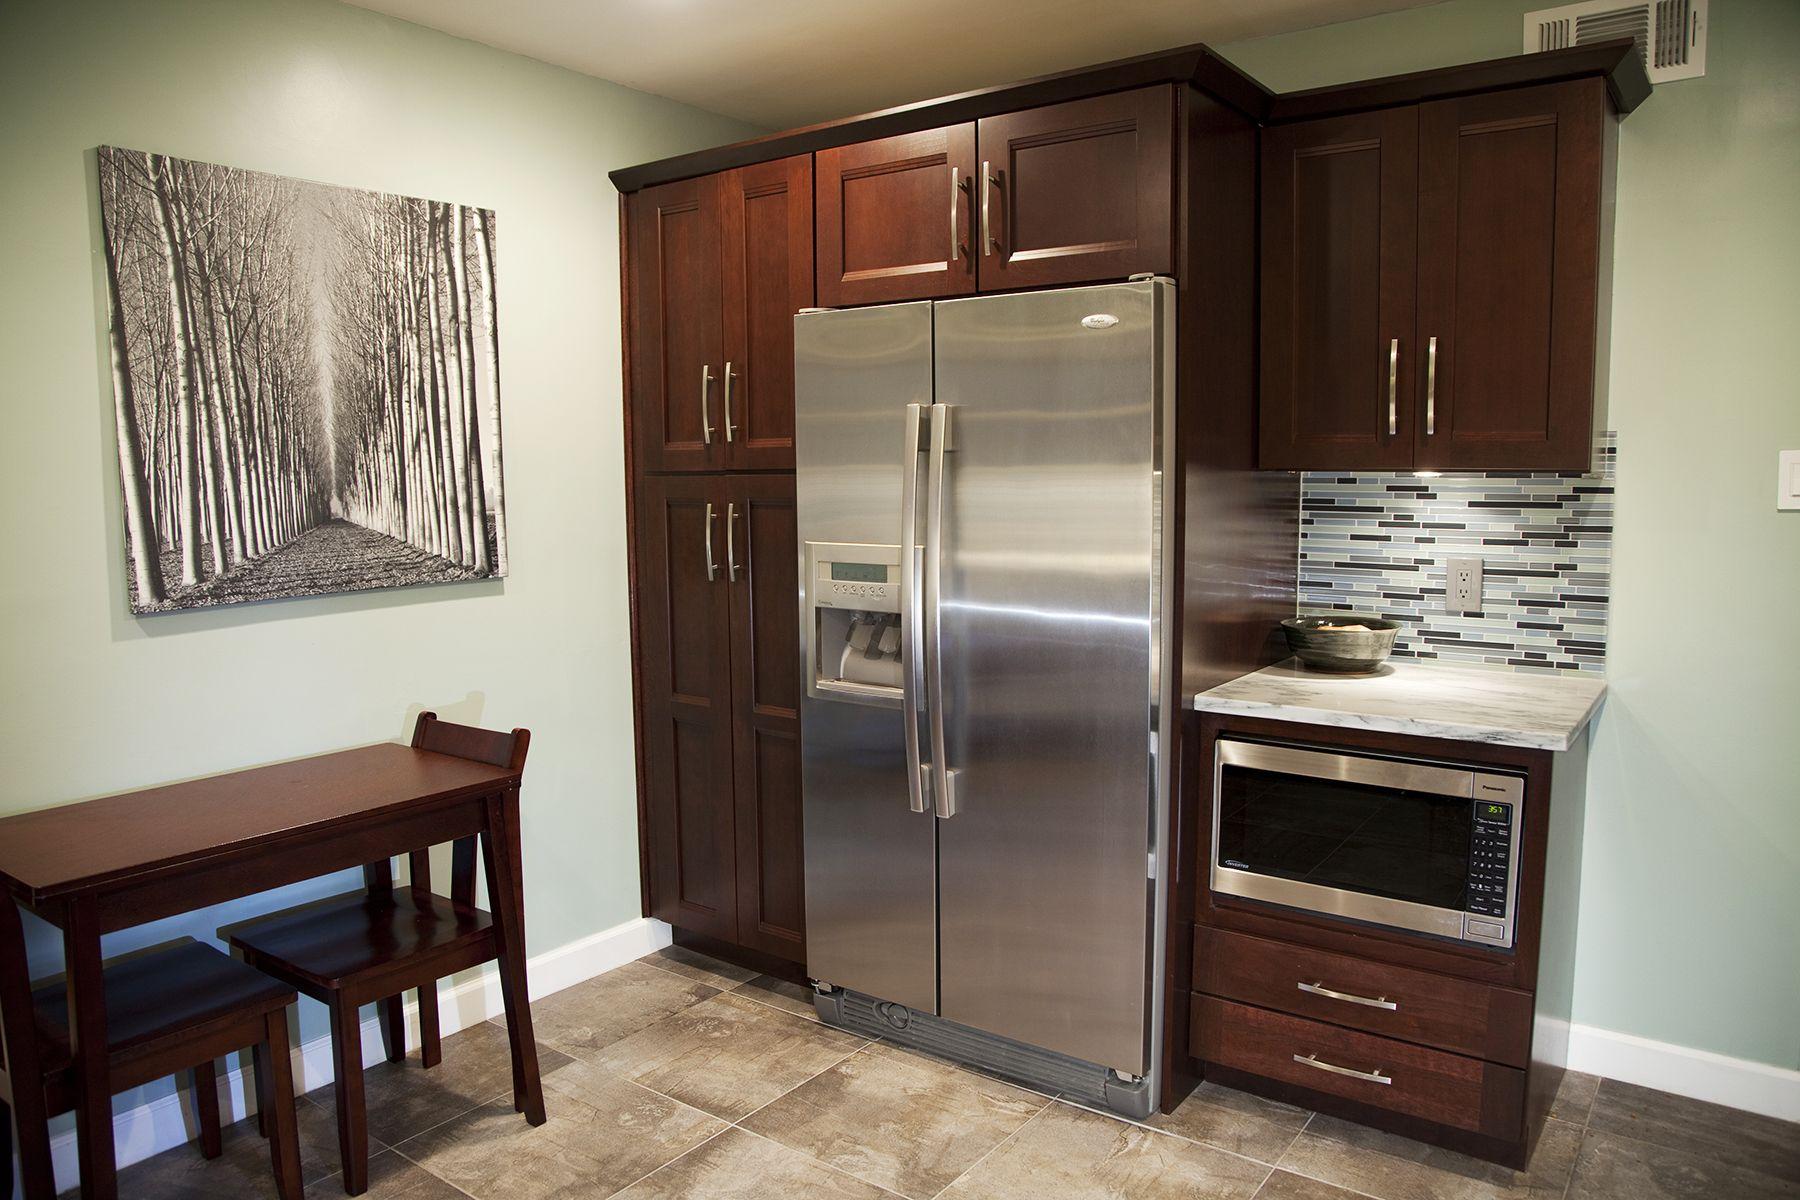 Modern kitchen design with a stainless steel refrigerator